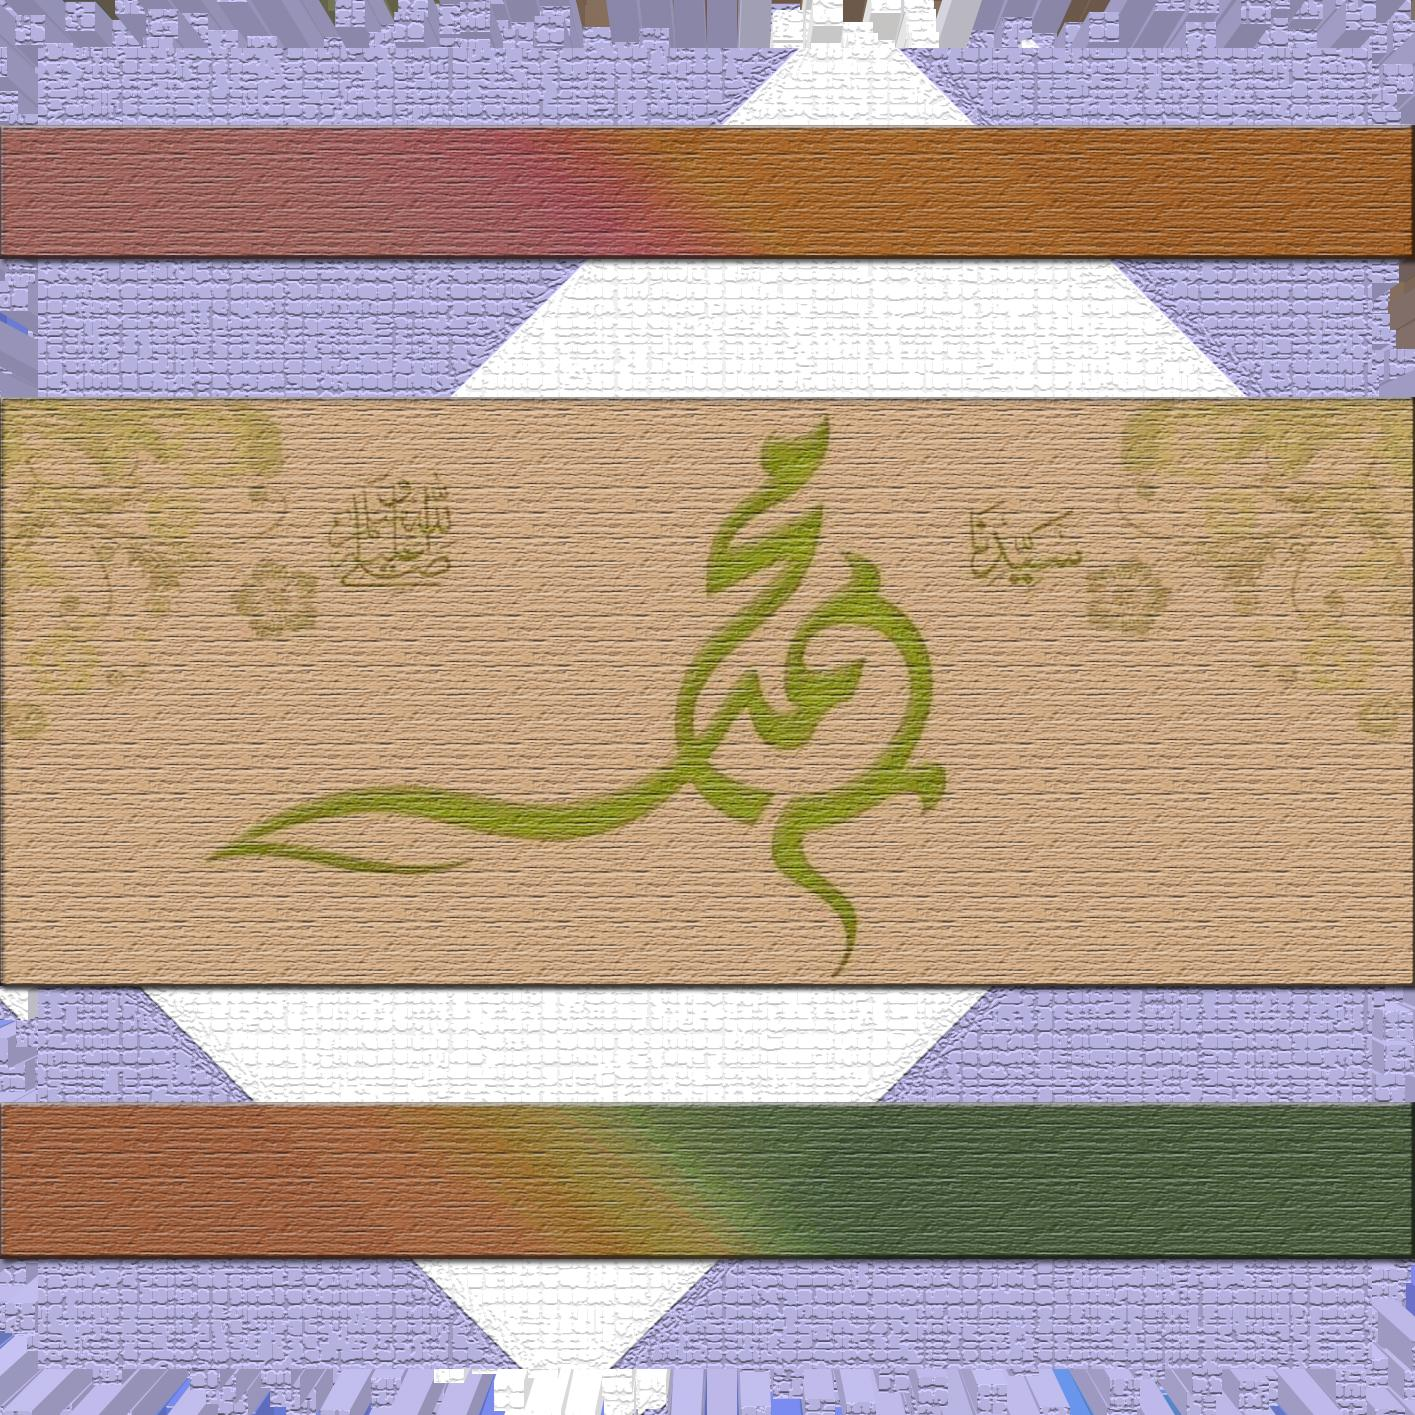 http://2.bp.blogspot.com/-m5XP0V1GTLU/T2BlOWhbzsI/AAAAAAAAApw/D5BuKAL9AB8/s1600/Wallpaper+Muhammad+Rasulullah+%252830%2529.jpg